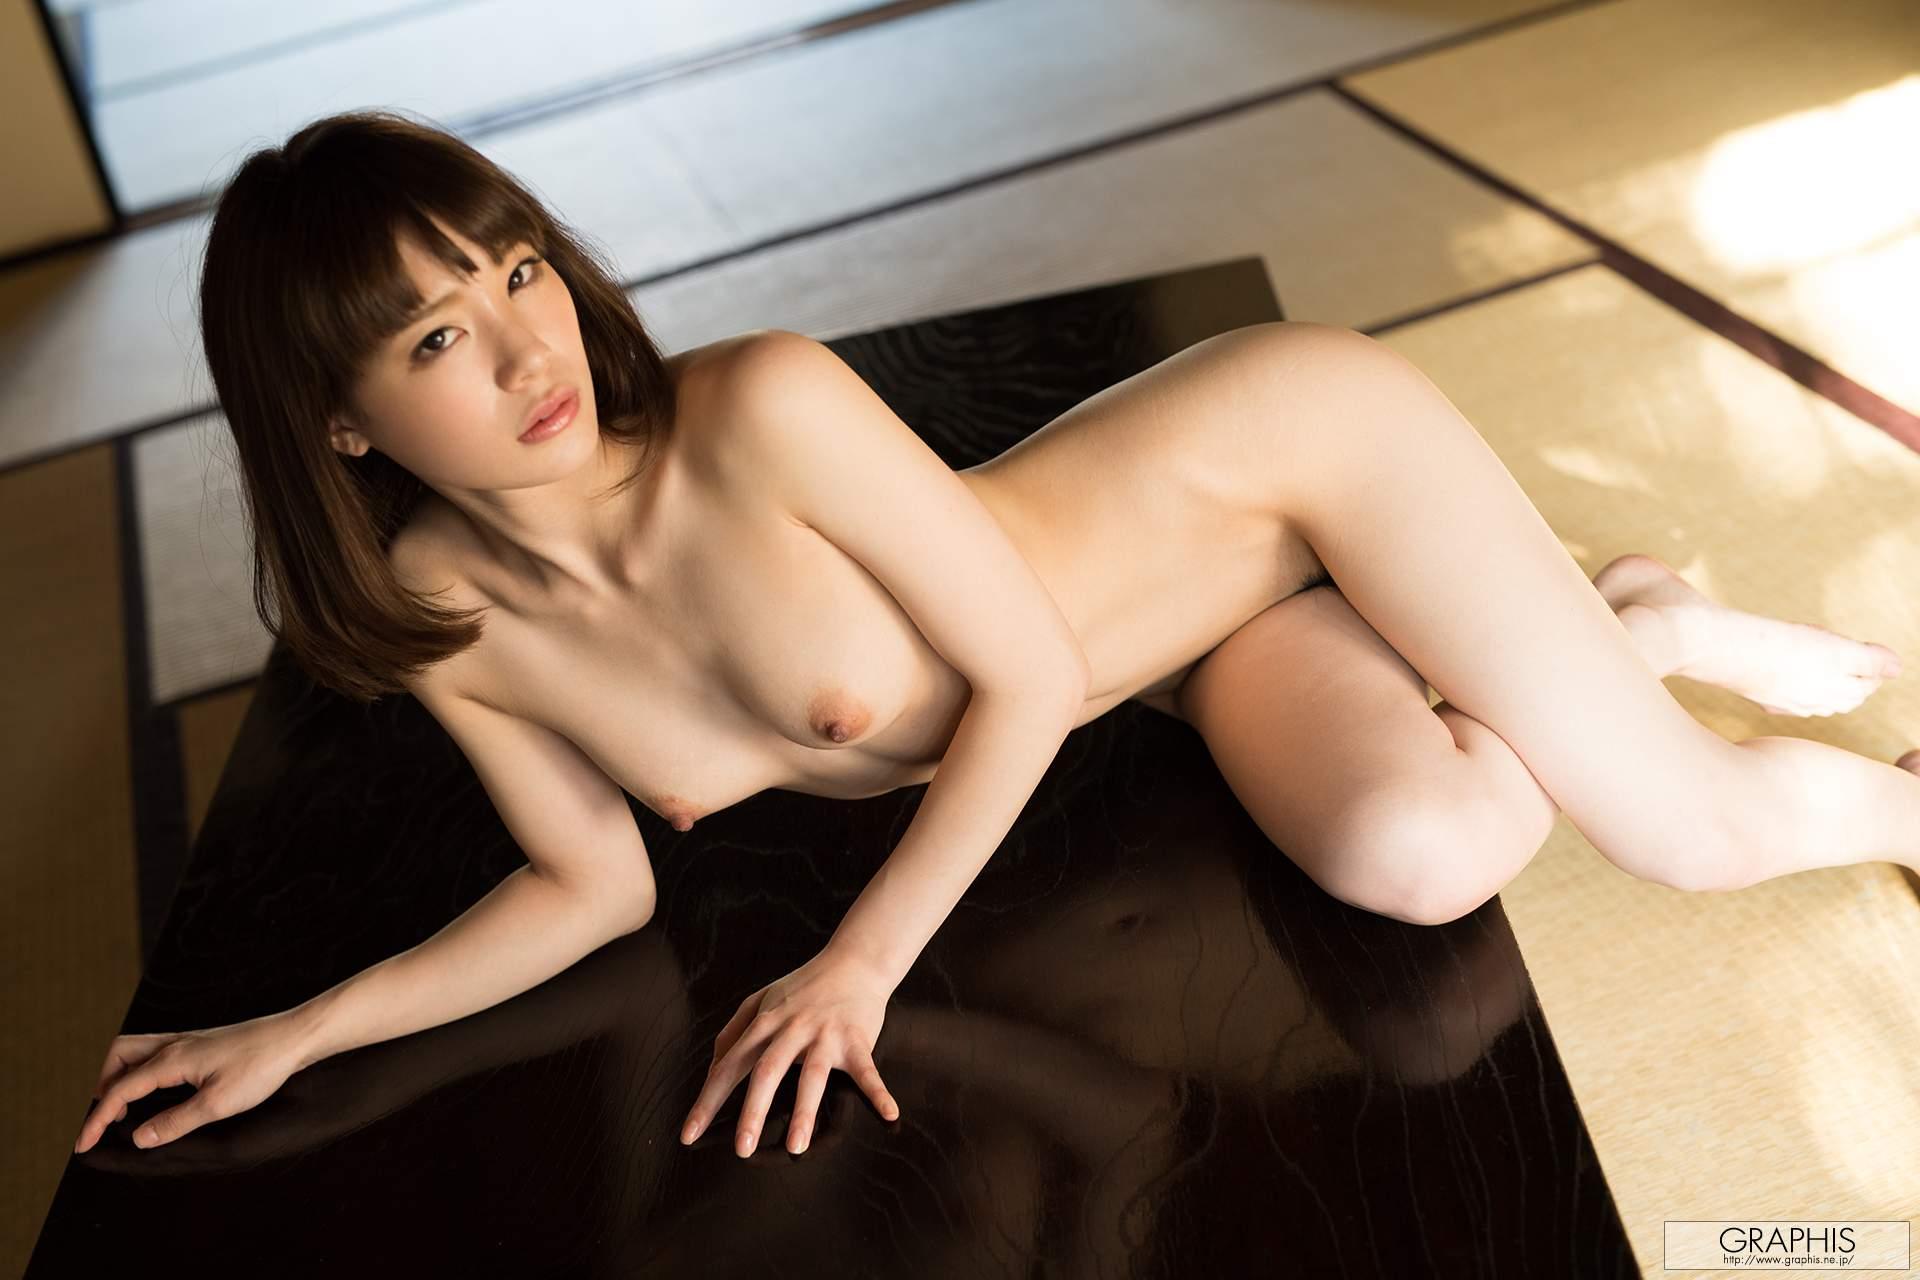 Airi Suzumura airi suzumura nude pictures. rating = 8.81/10